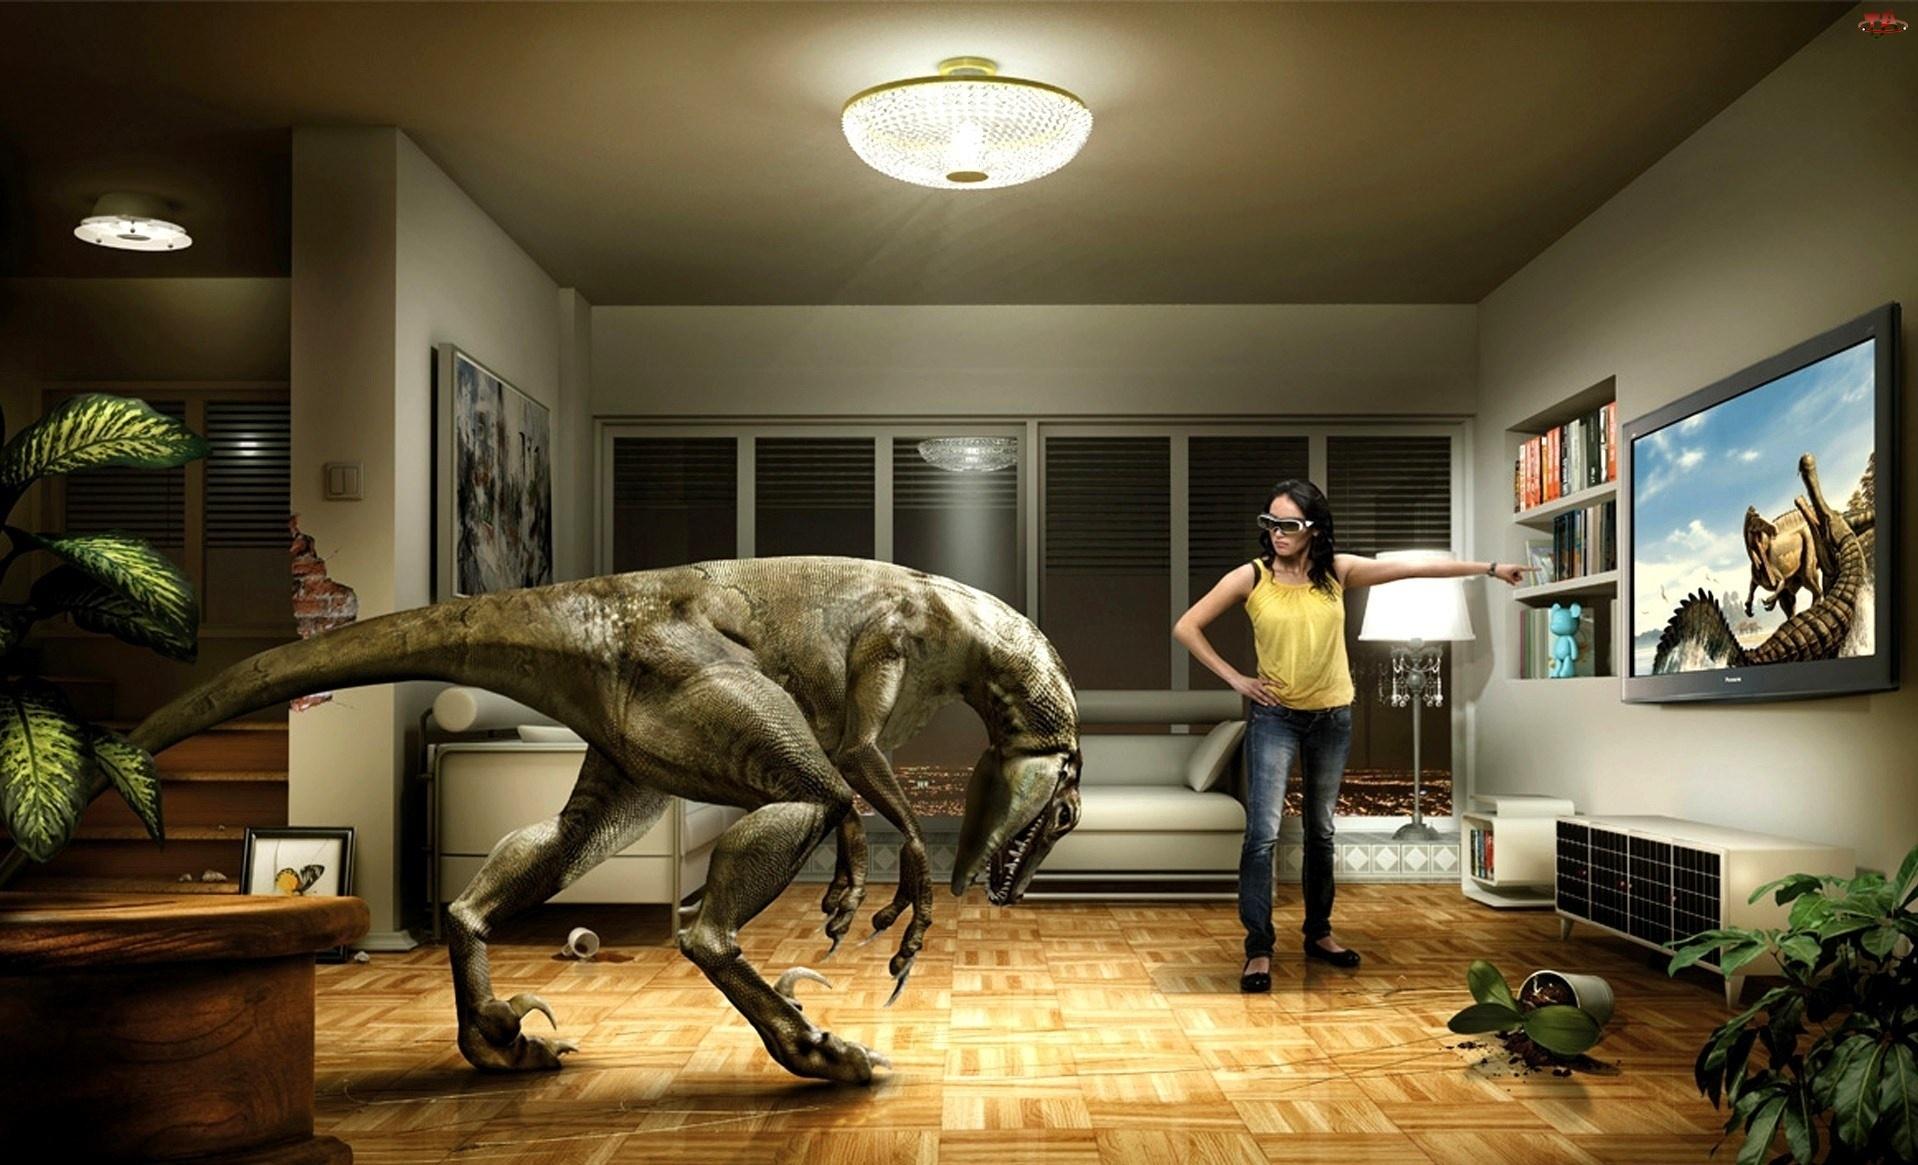 Telewizor, Kobieta, Dinozaur